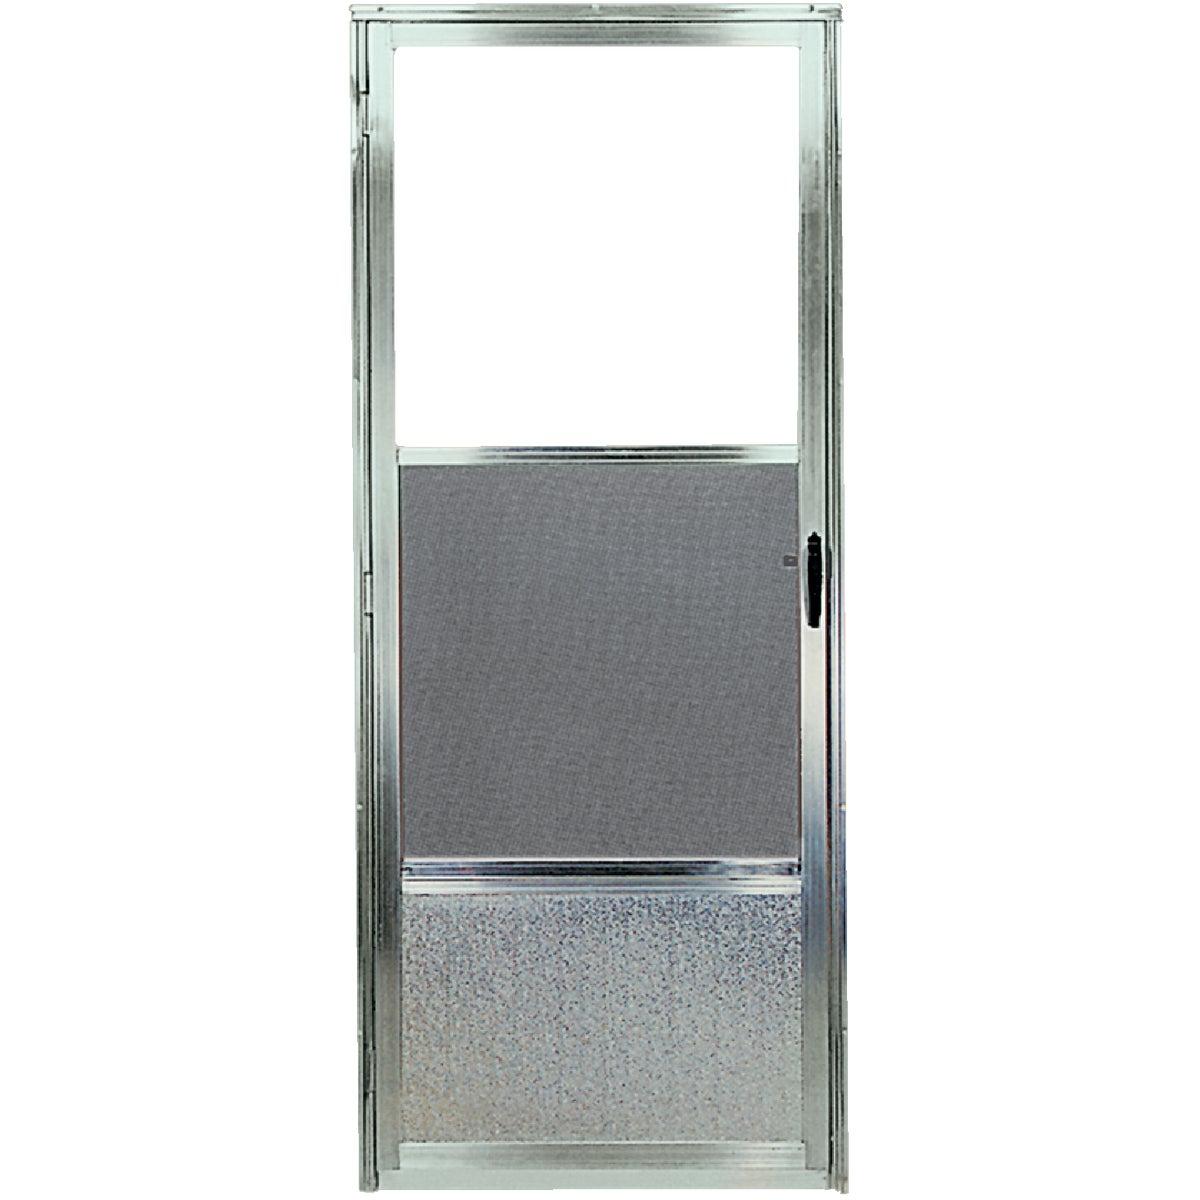 Croft LLC 161 2668 LH MILL DOOR F25752